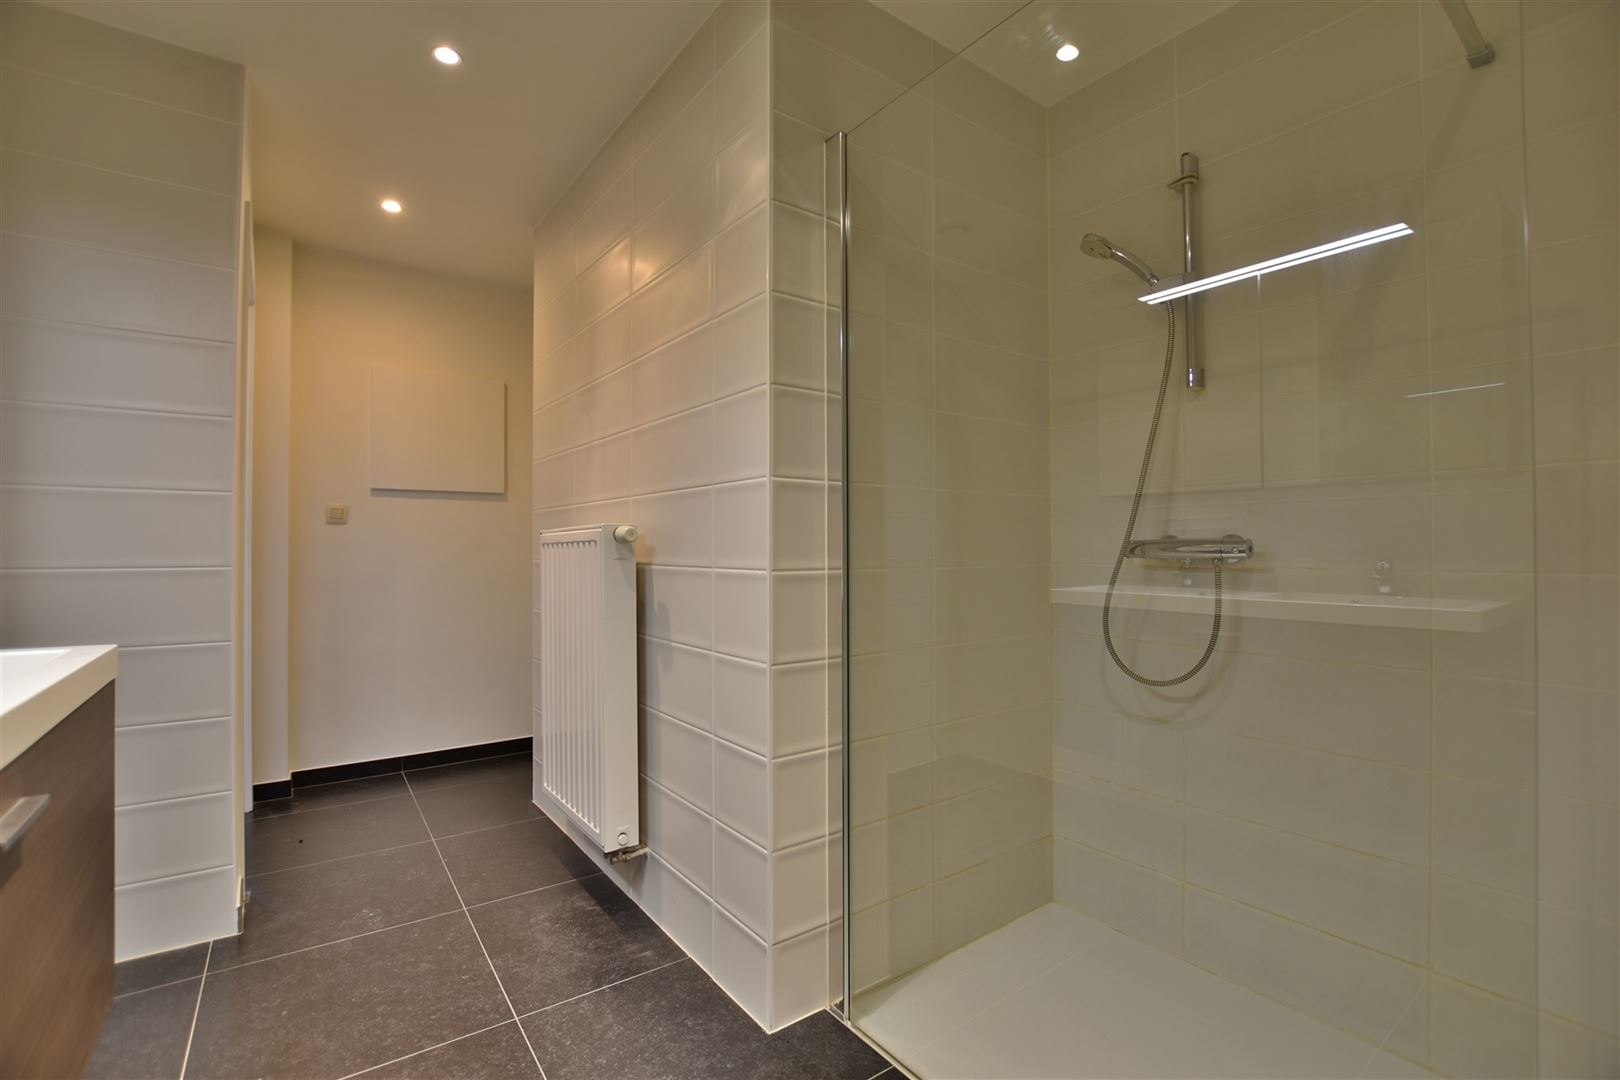 Foto 21 : Duplex/Penthouse te 9200 Sint-Gillis-bij-Dendermonde (België) - Prijs € 278.000